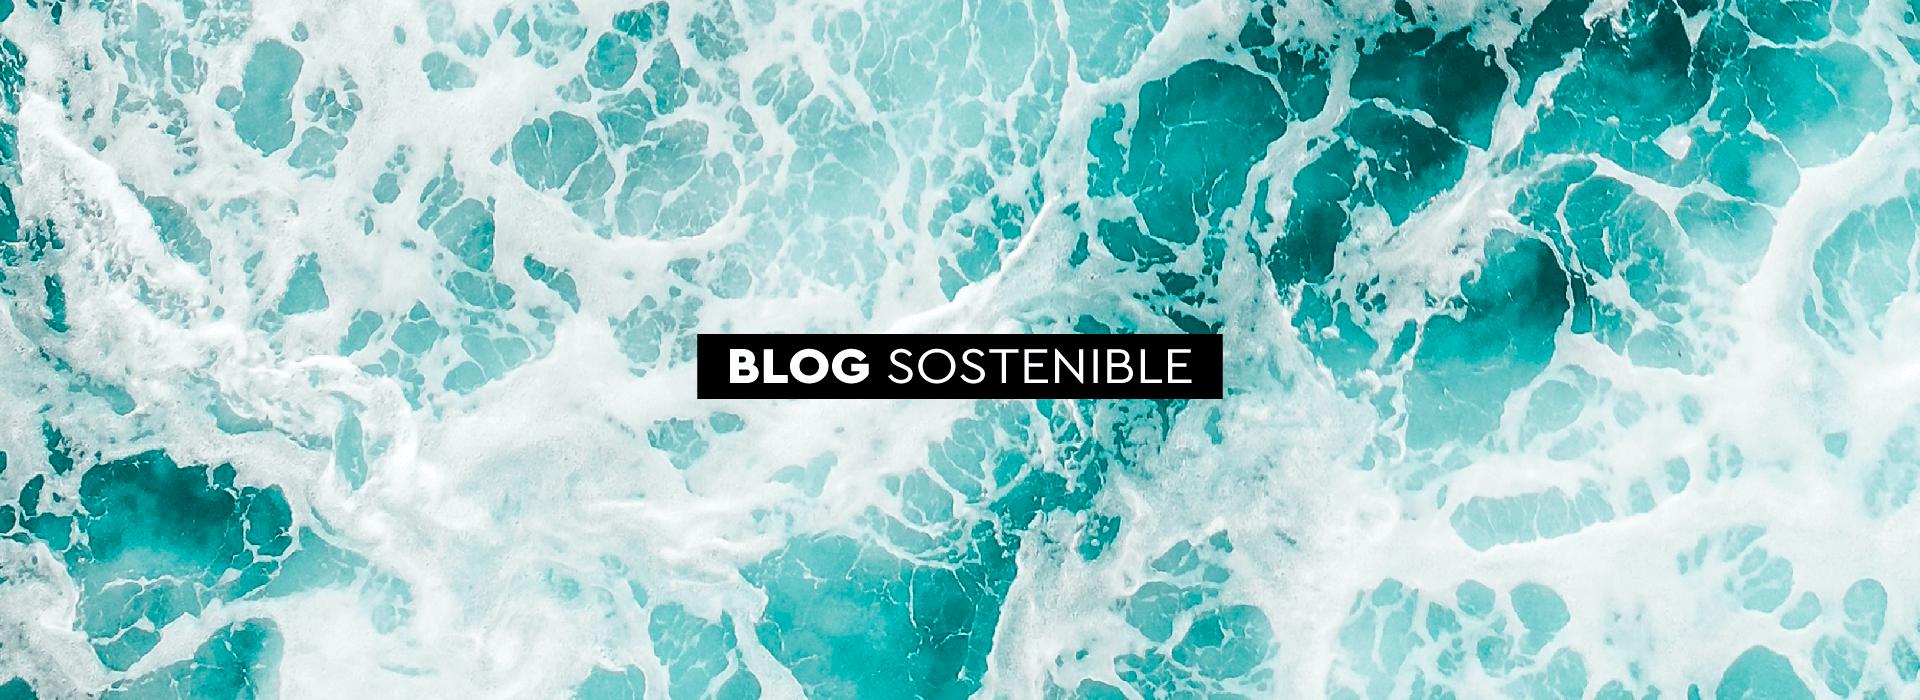 blog sostenible